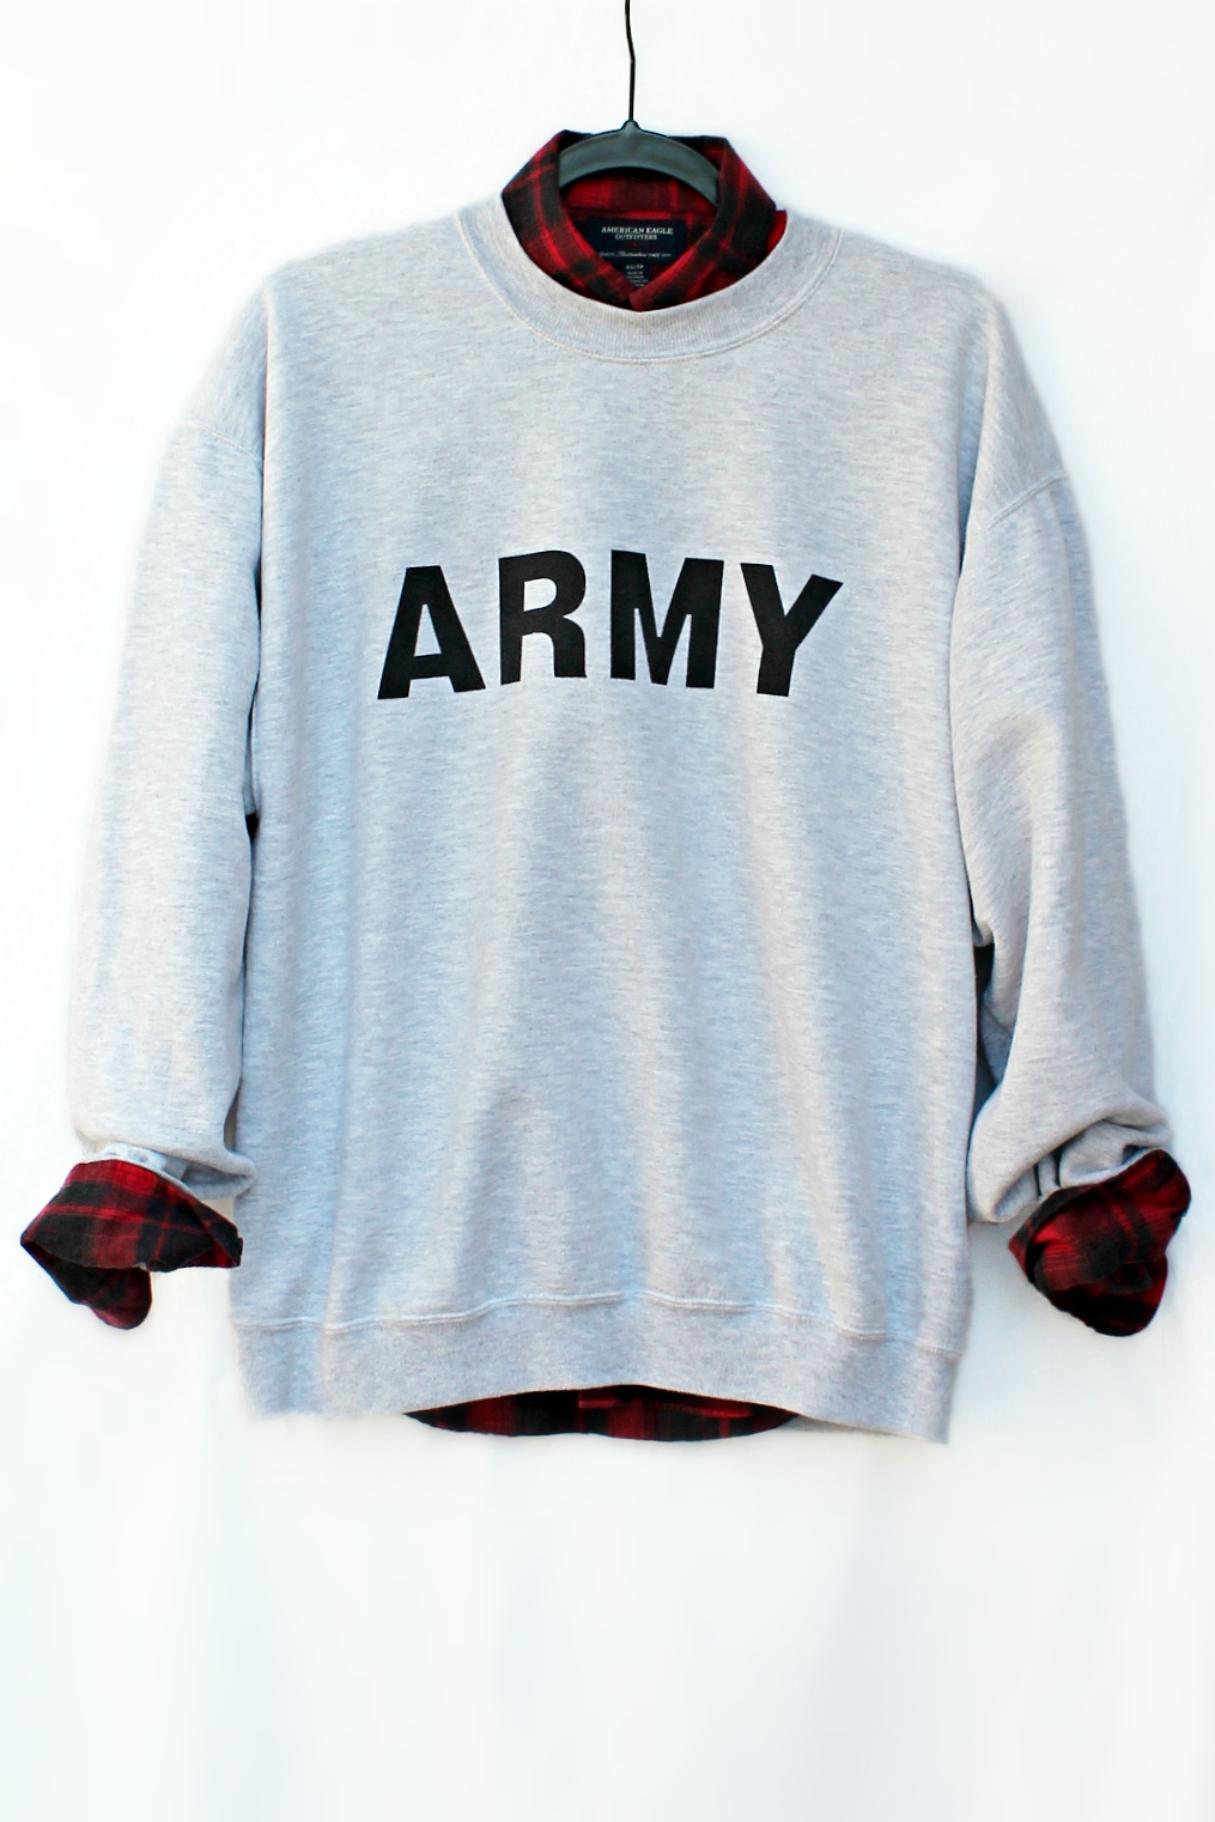 Army Sweater | Just Vu